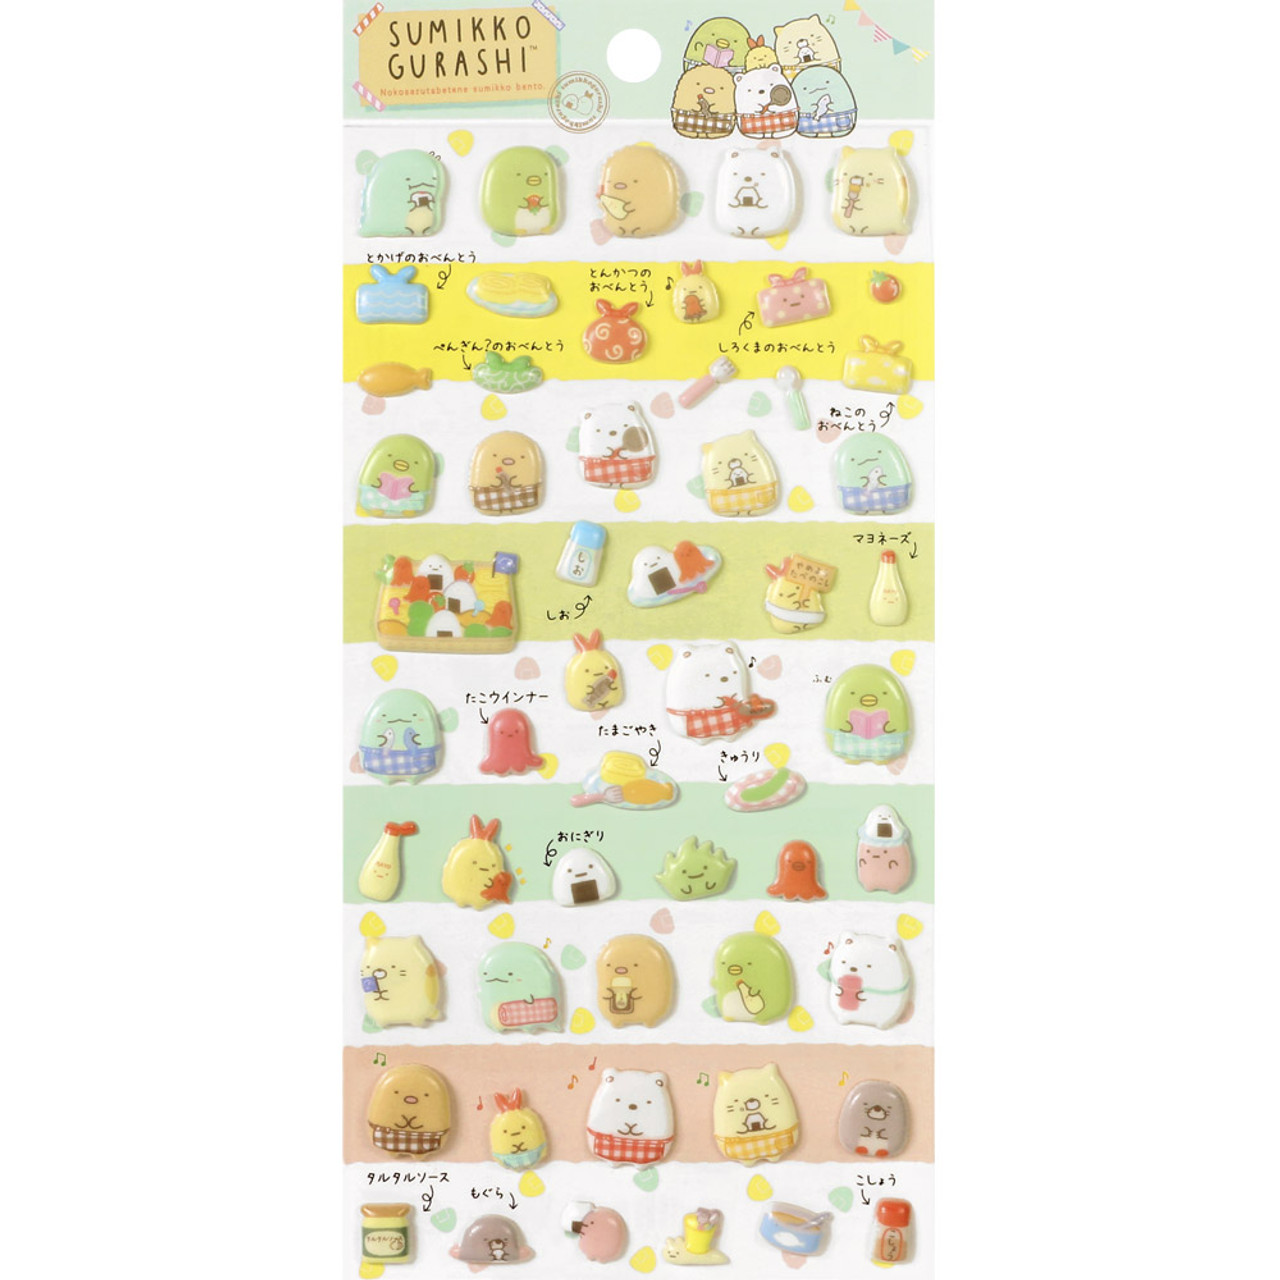 Sumikko Gurashi Puffy Sticker SE31401 ( Front View )